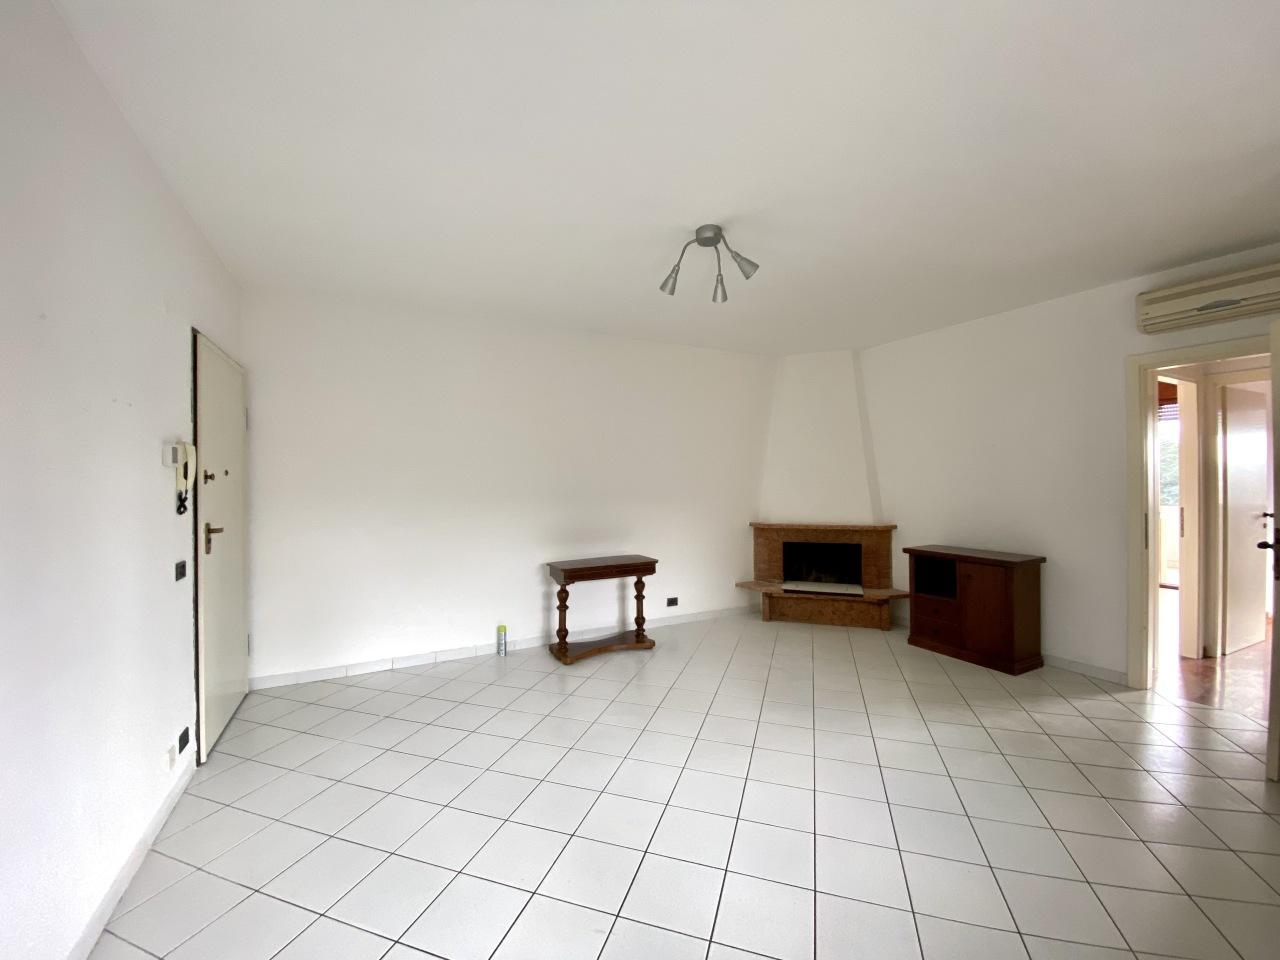 Appartamento in vendita a Jesi (AN)